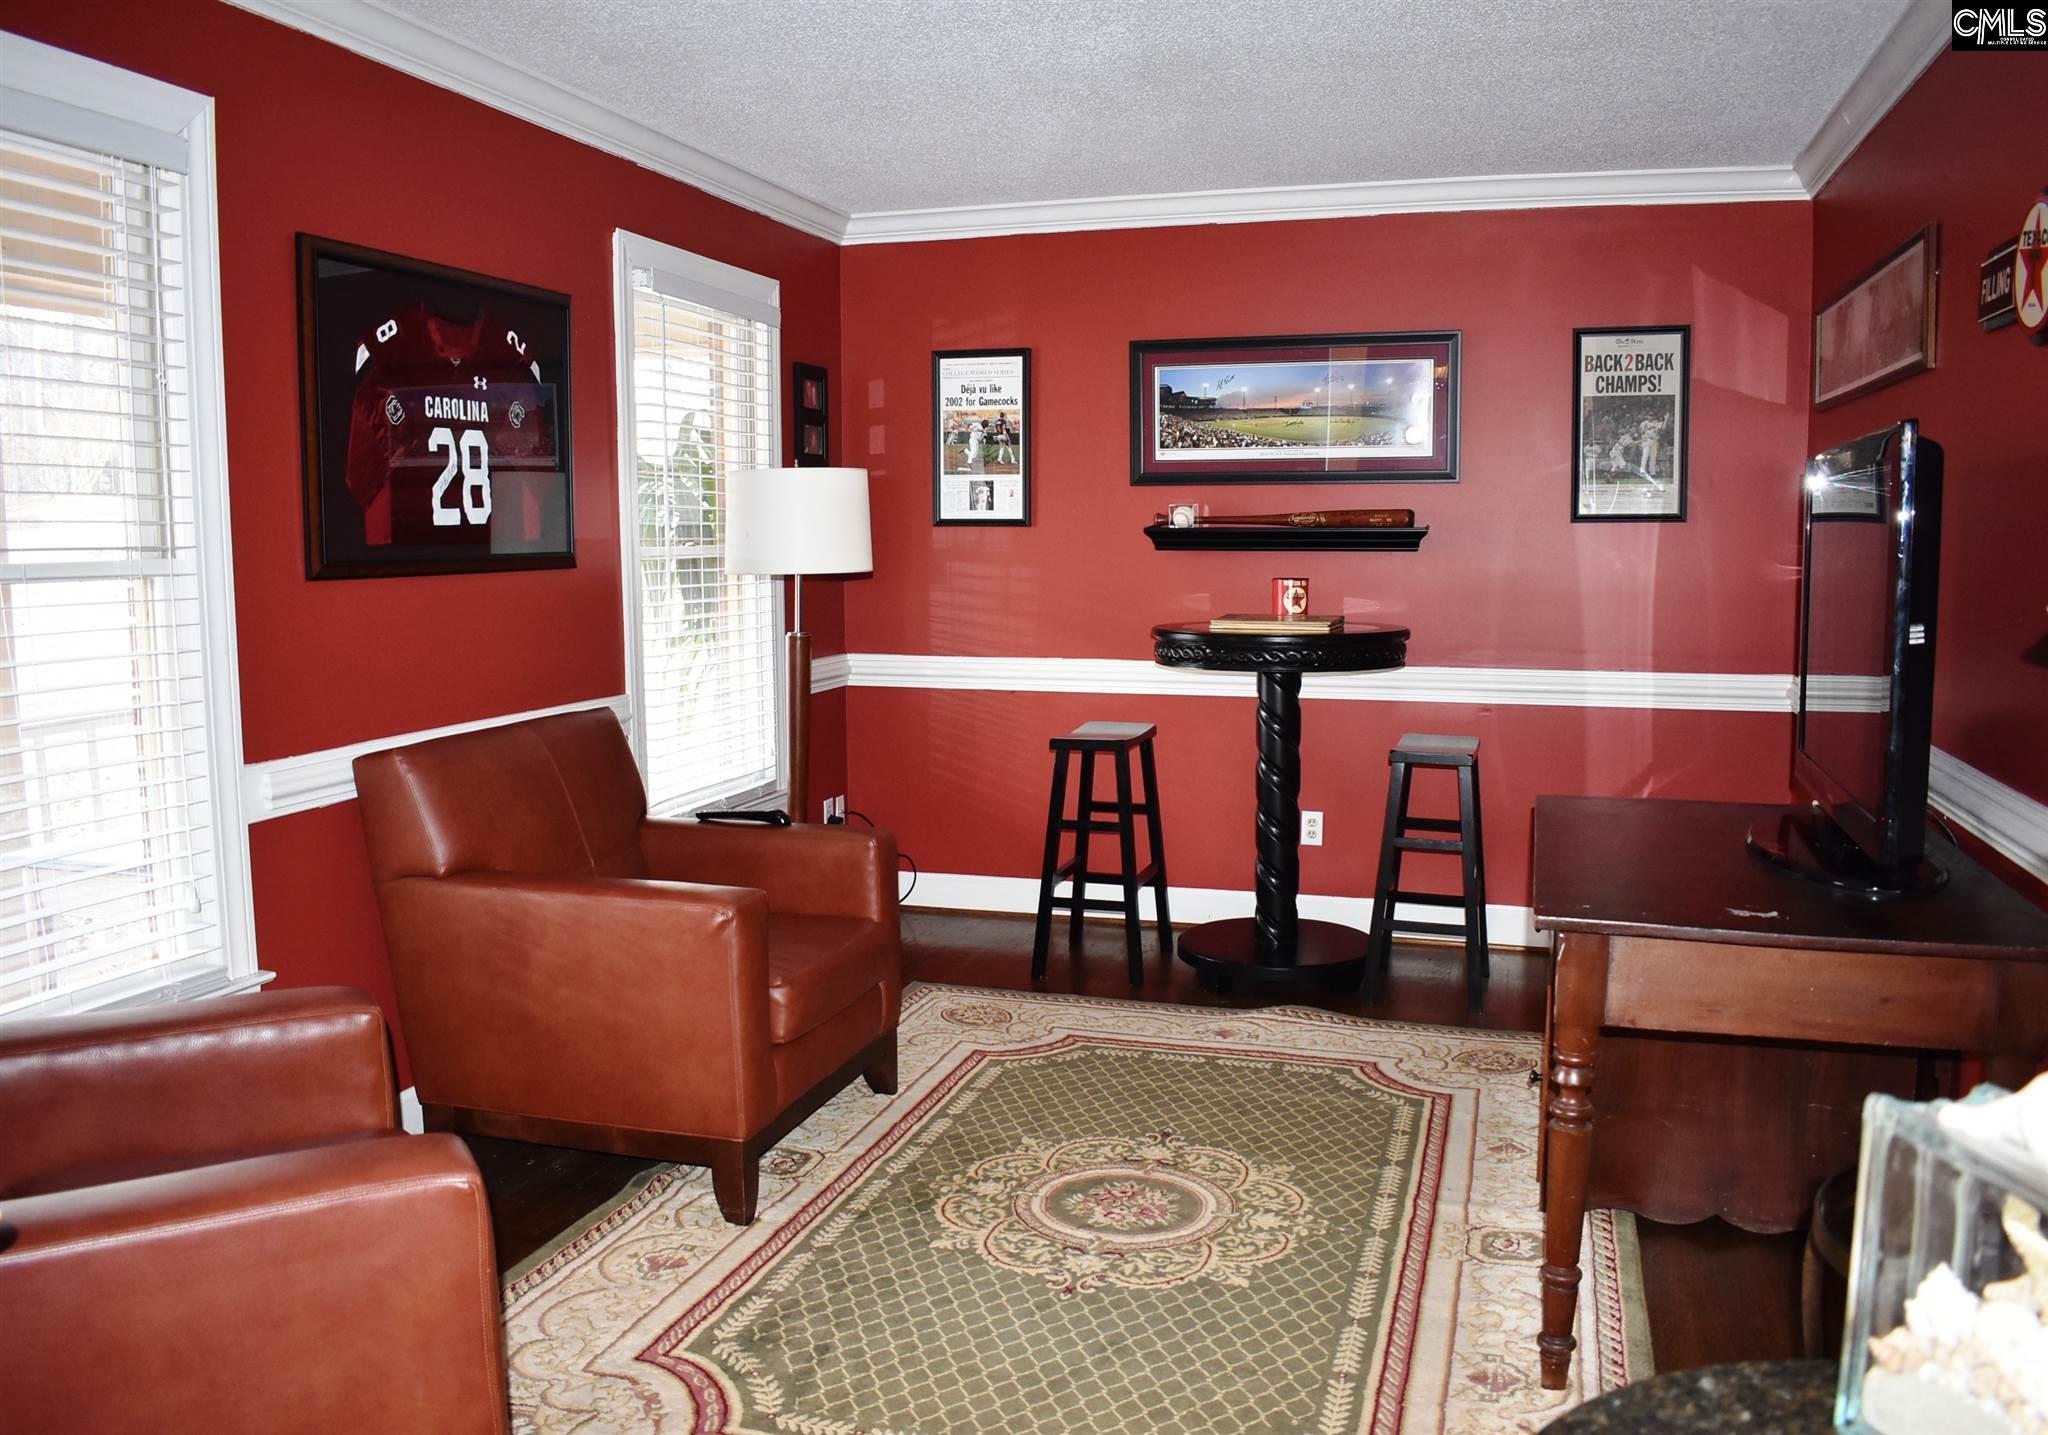 MLS 121 Blackhawk West Columbia South Carolina for $290 000